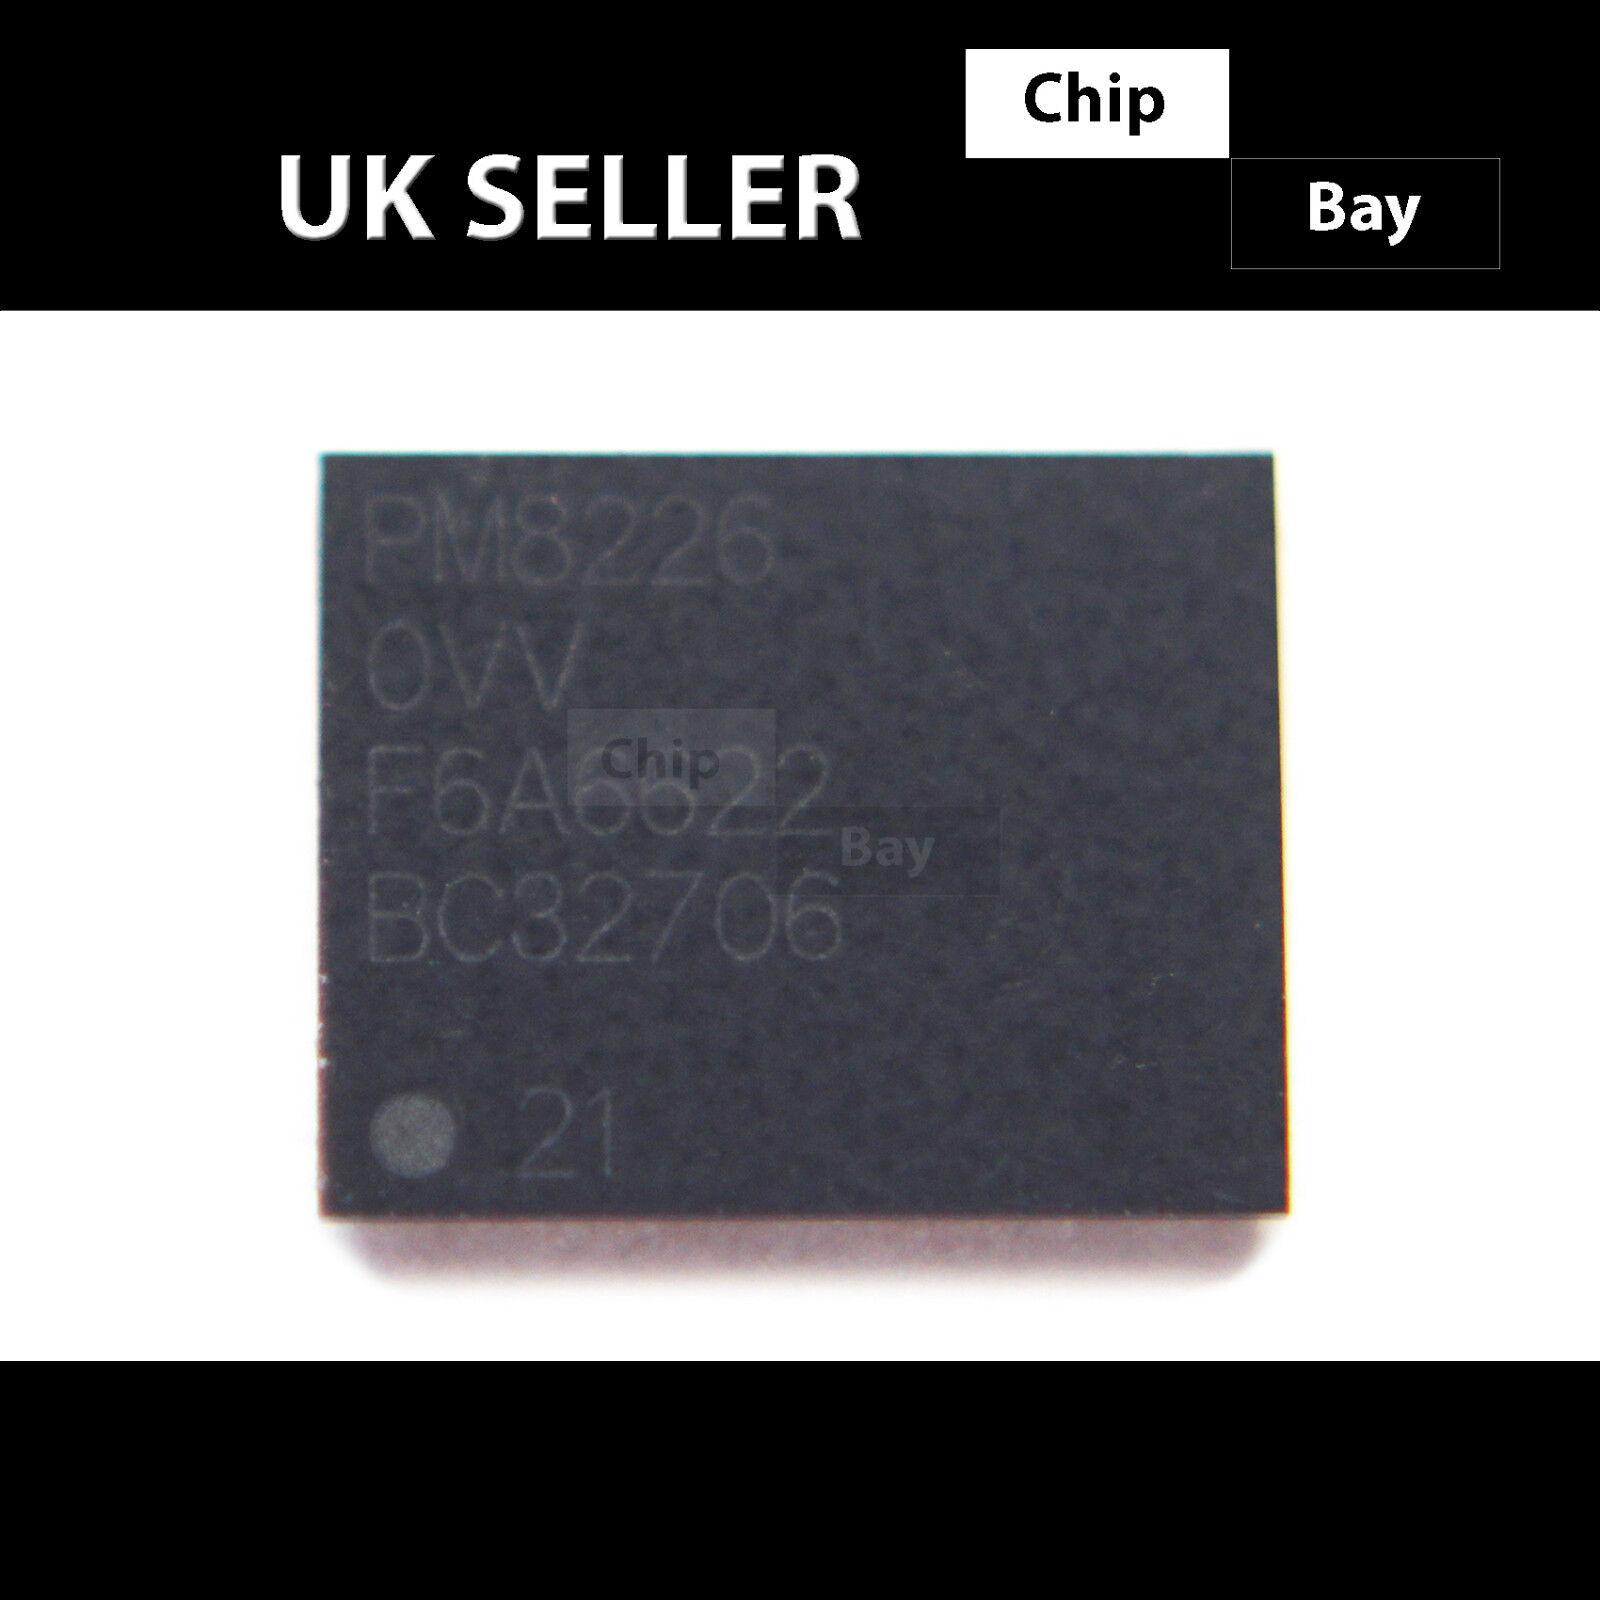 Samsung puissance g7102 puissance Samsung ic puce pm8226 e0f1b8